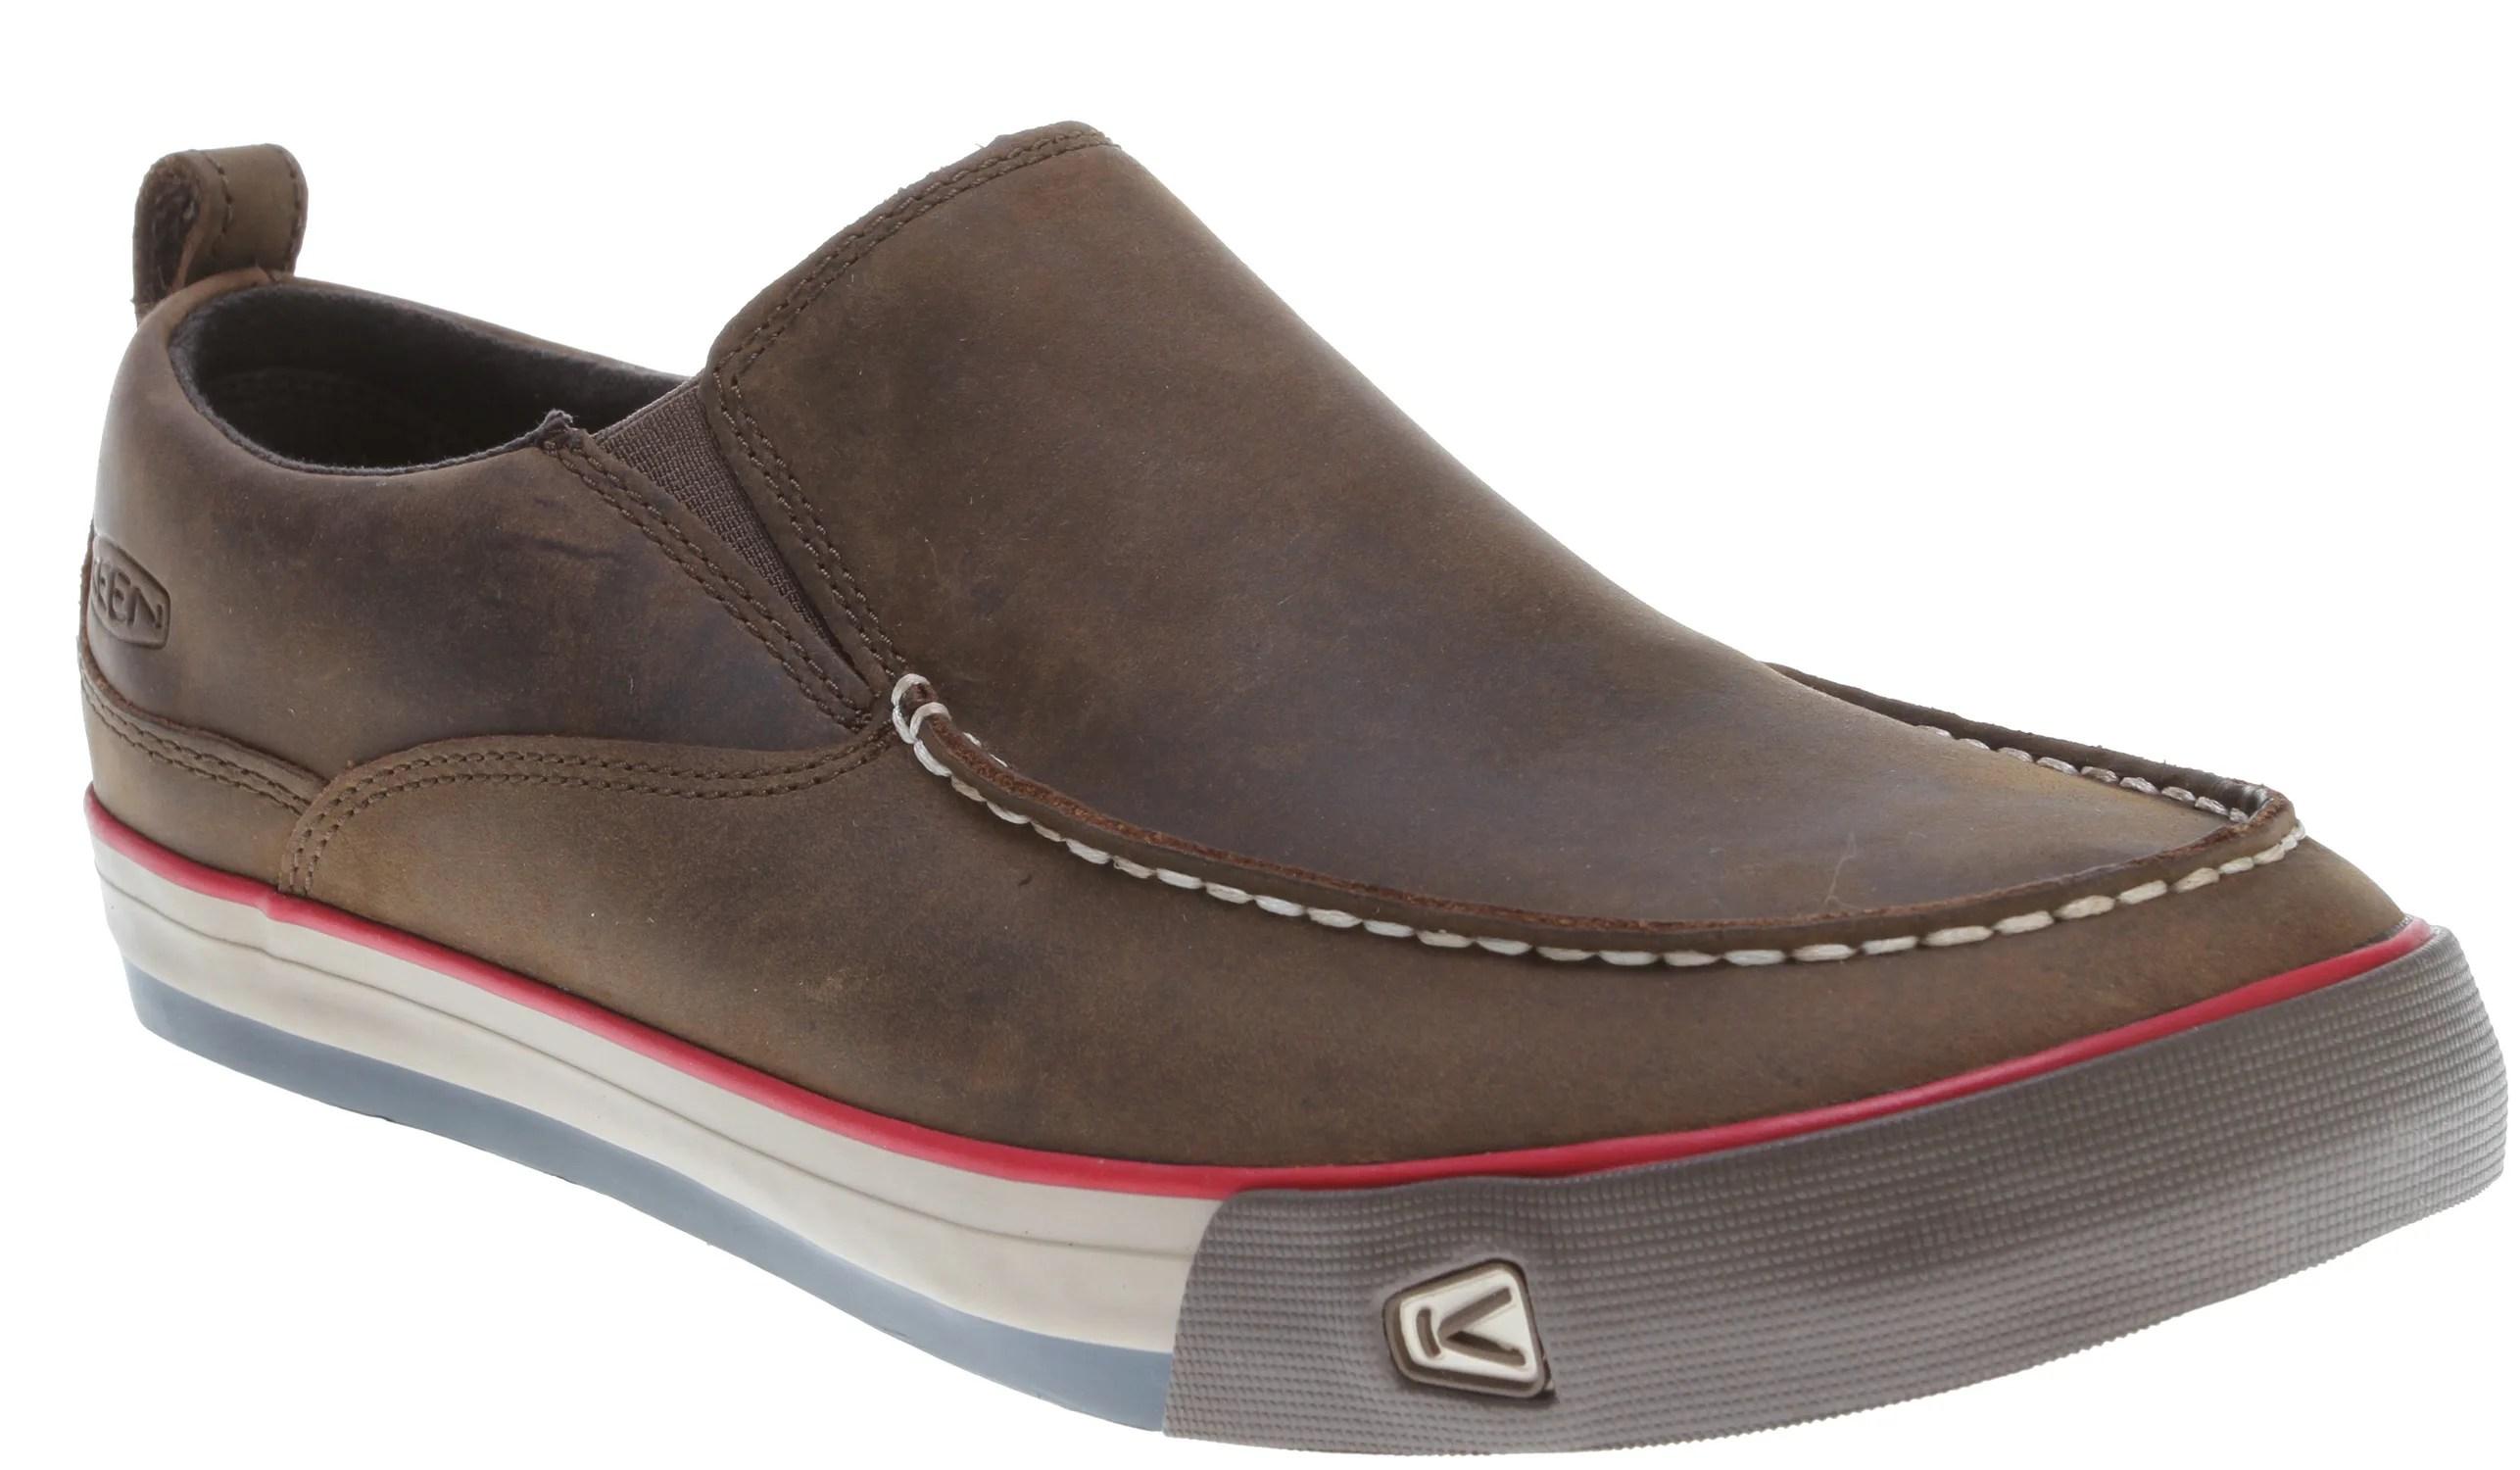 Keen Shoes Slip